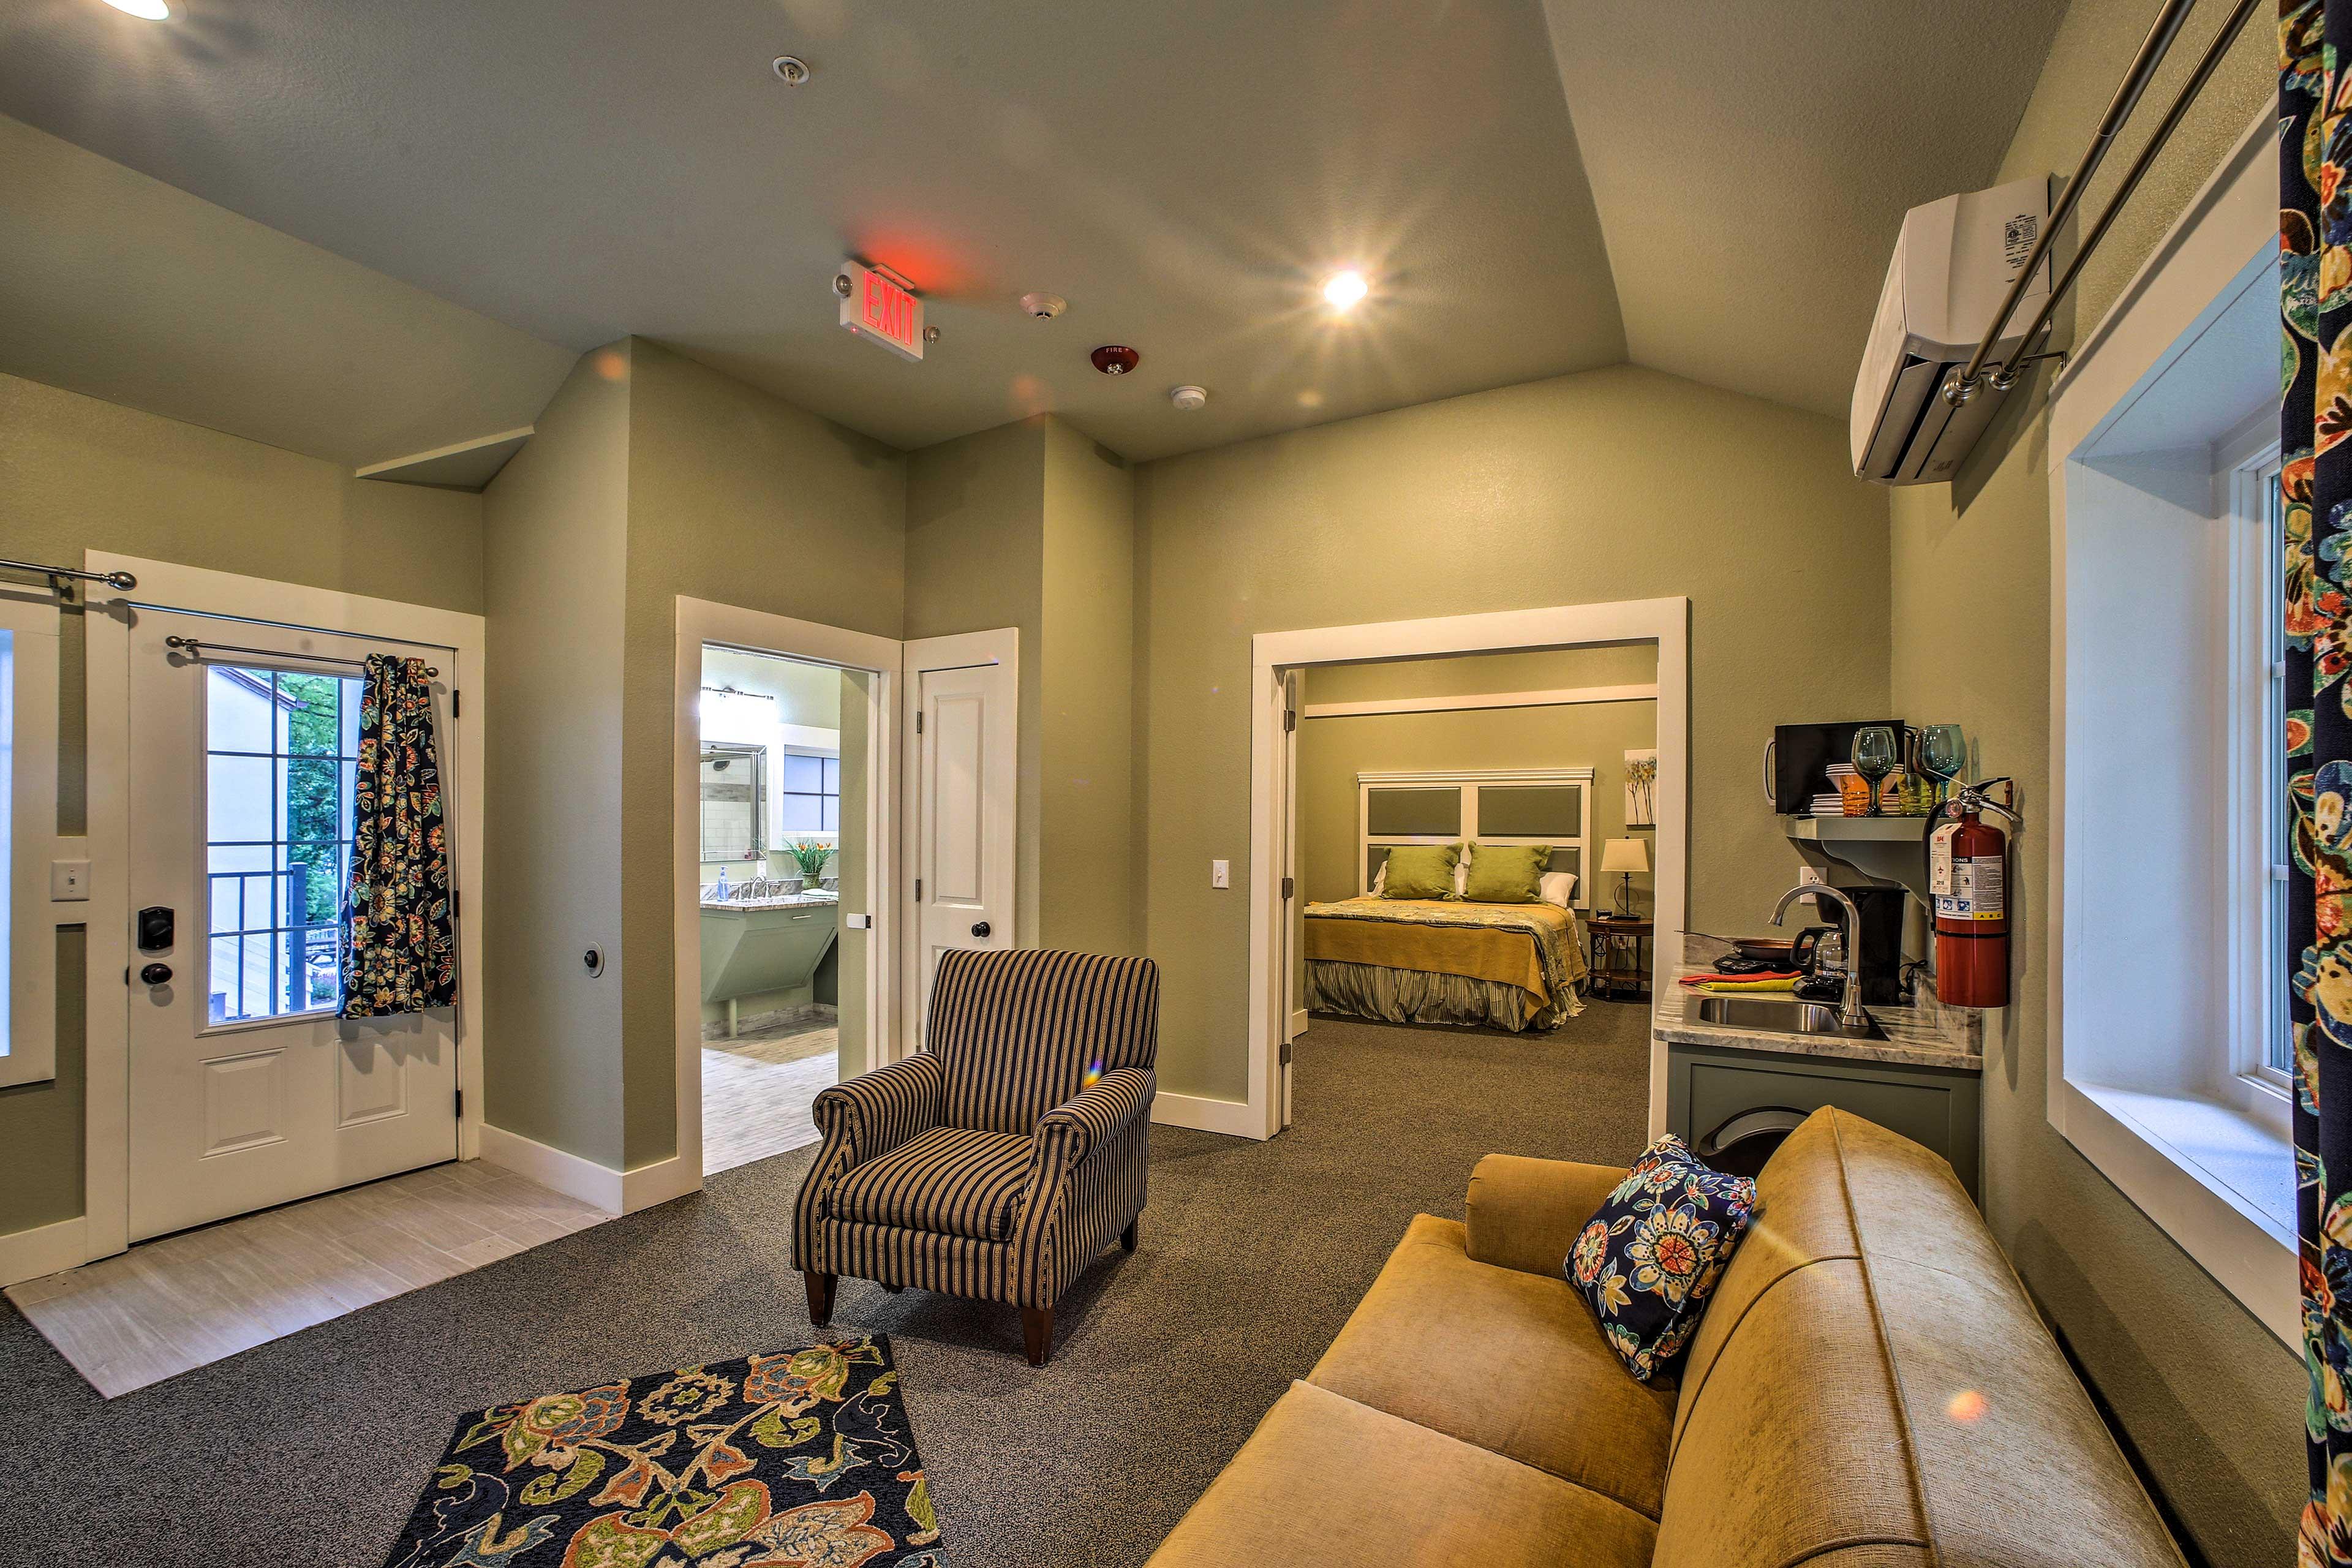 This quaint unit has plenty of room for a 1-bedroom cottage!